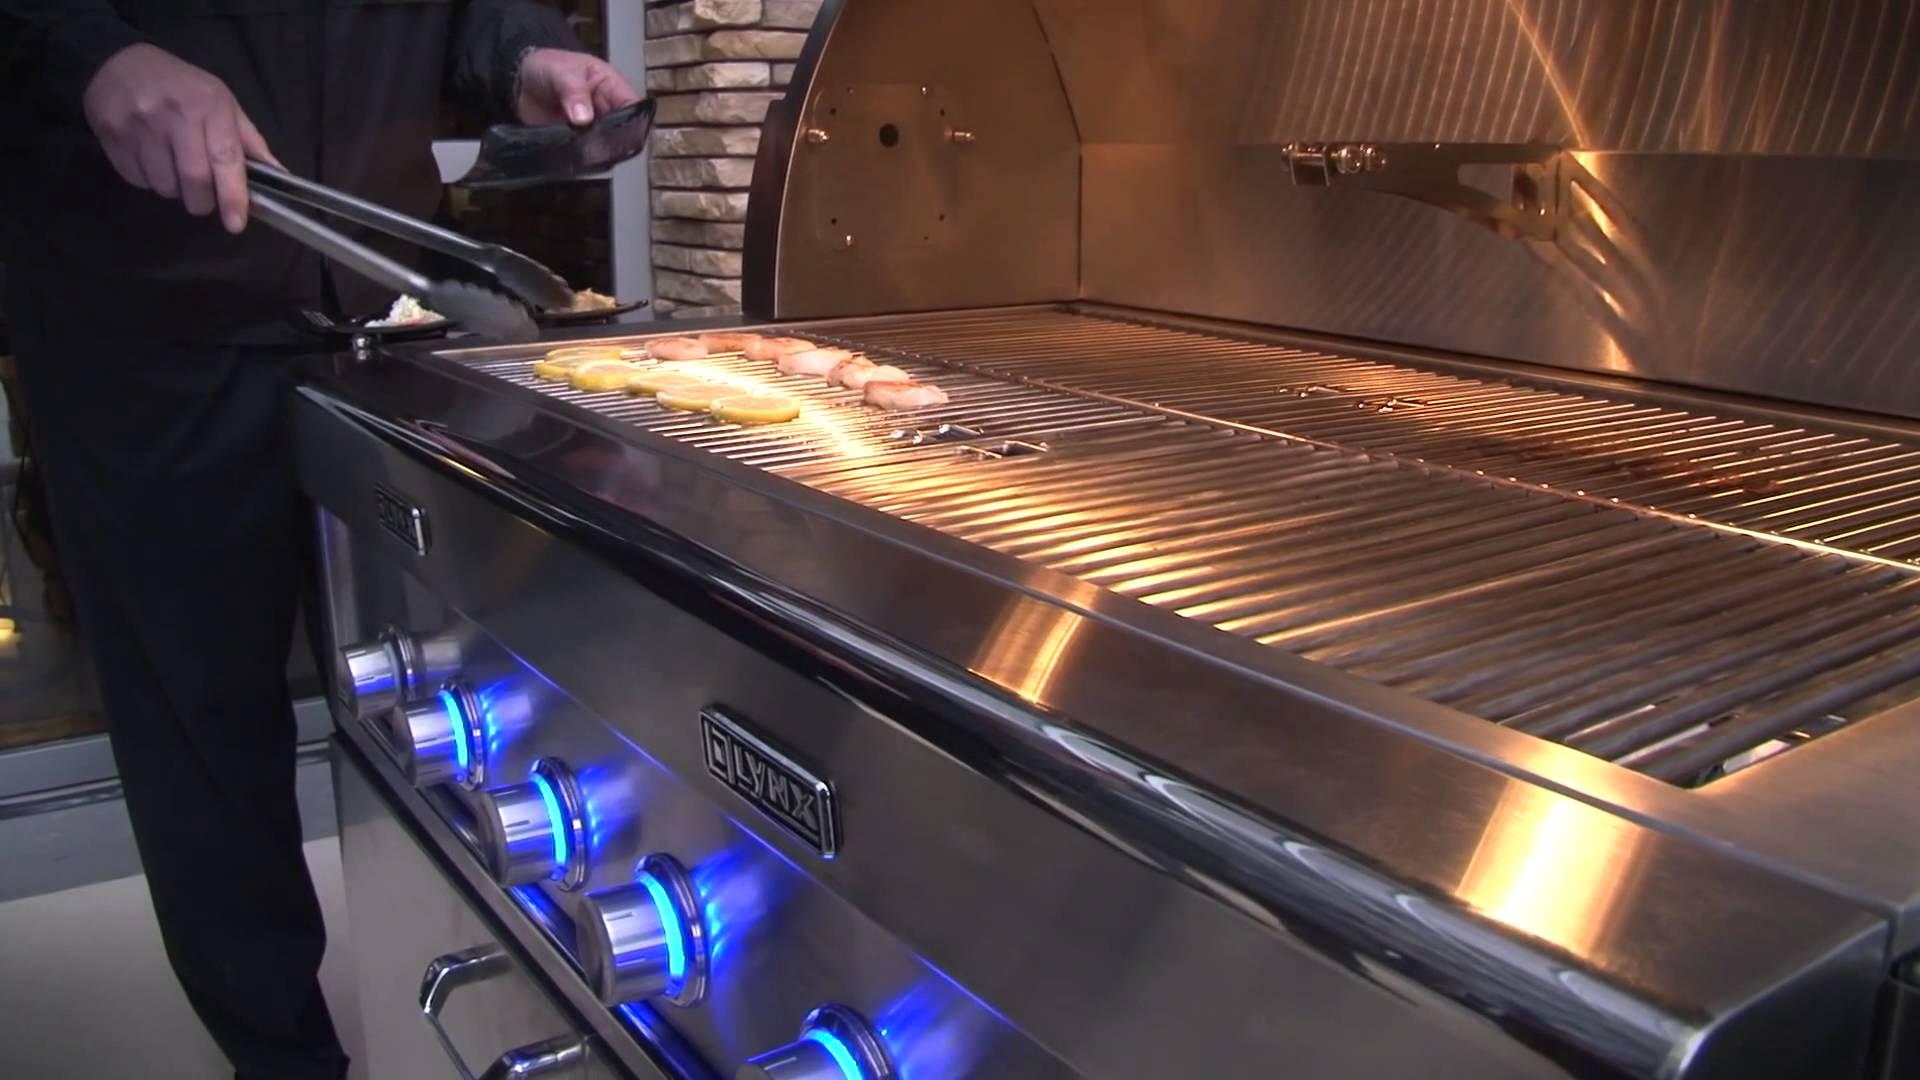 grilling gadgets